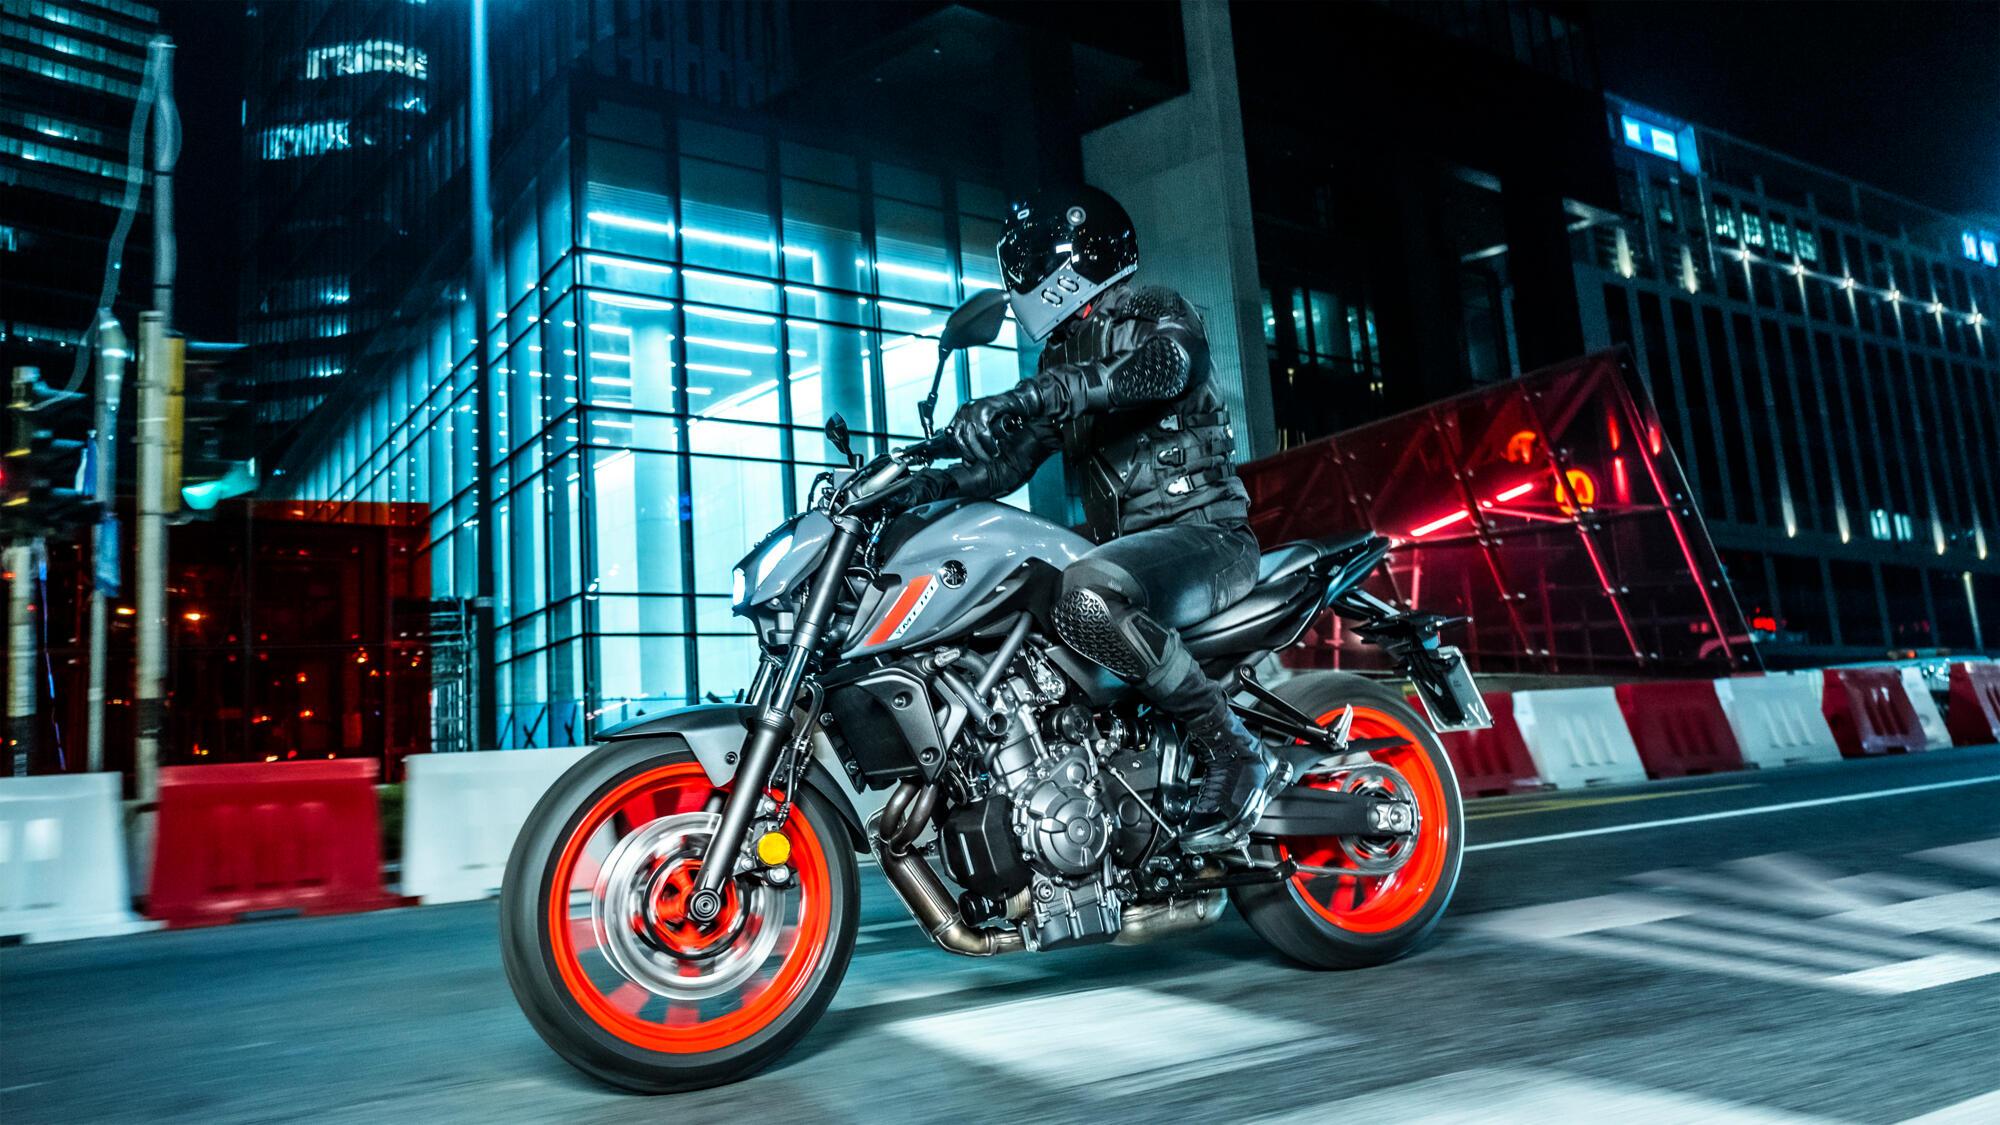 2021-Yamaha-MT07-EU-Storm_Fluo-Action-003-03